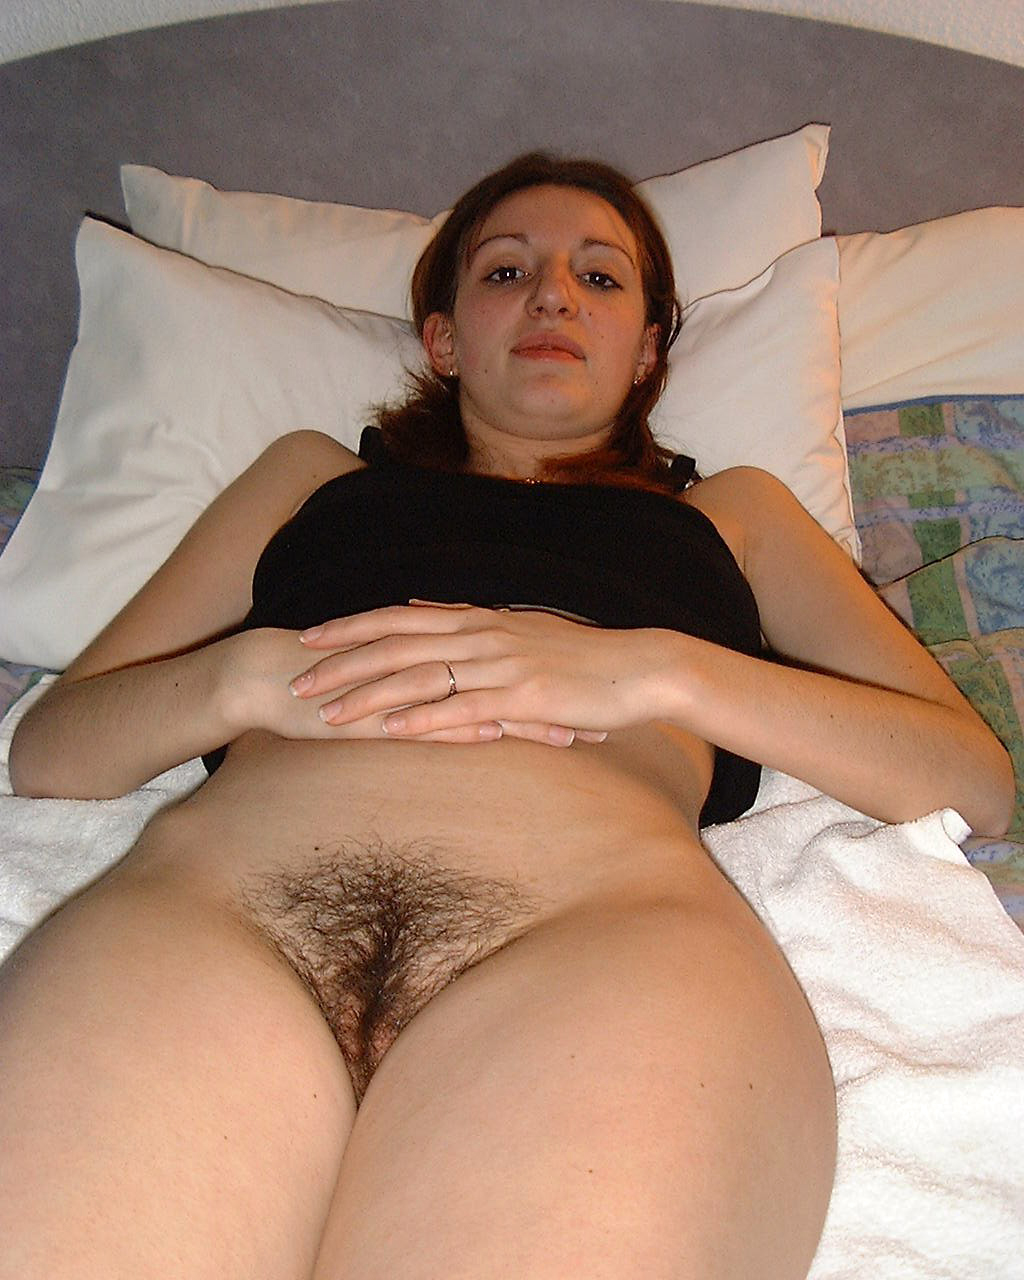 Breast feeding and intimacy